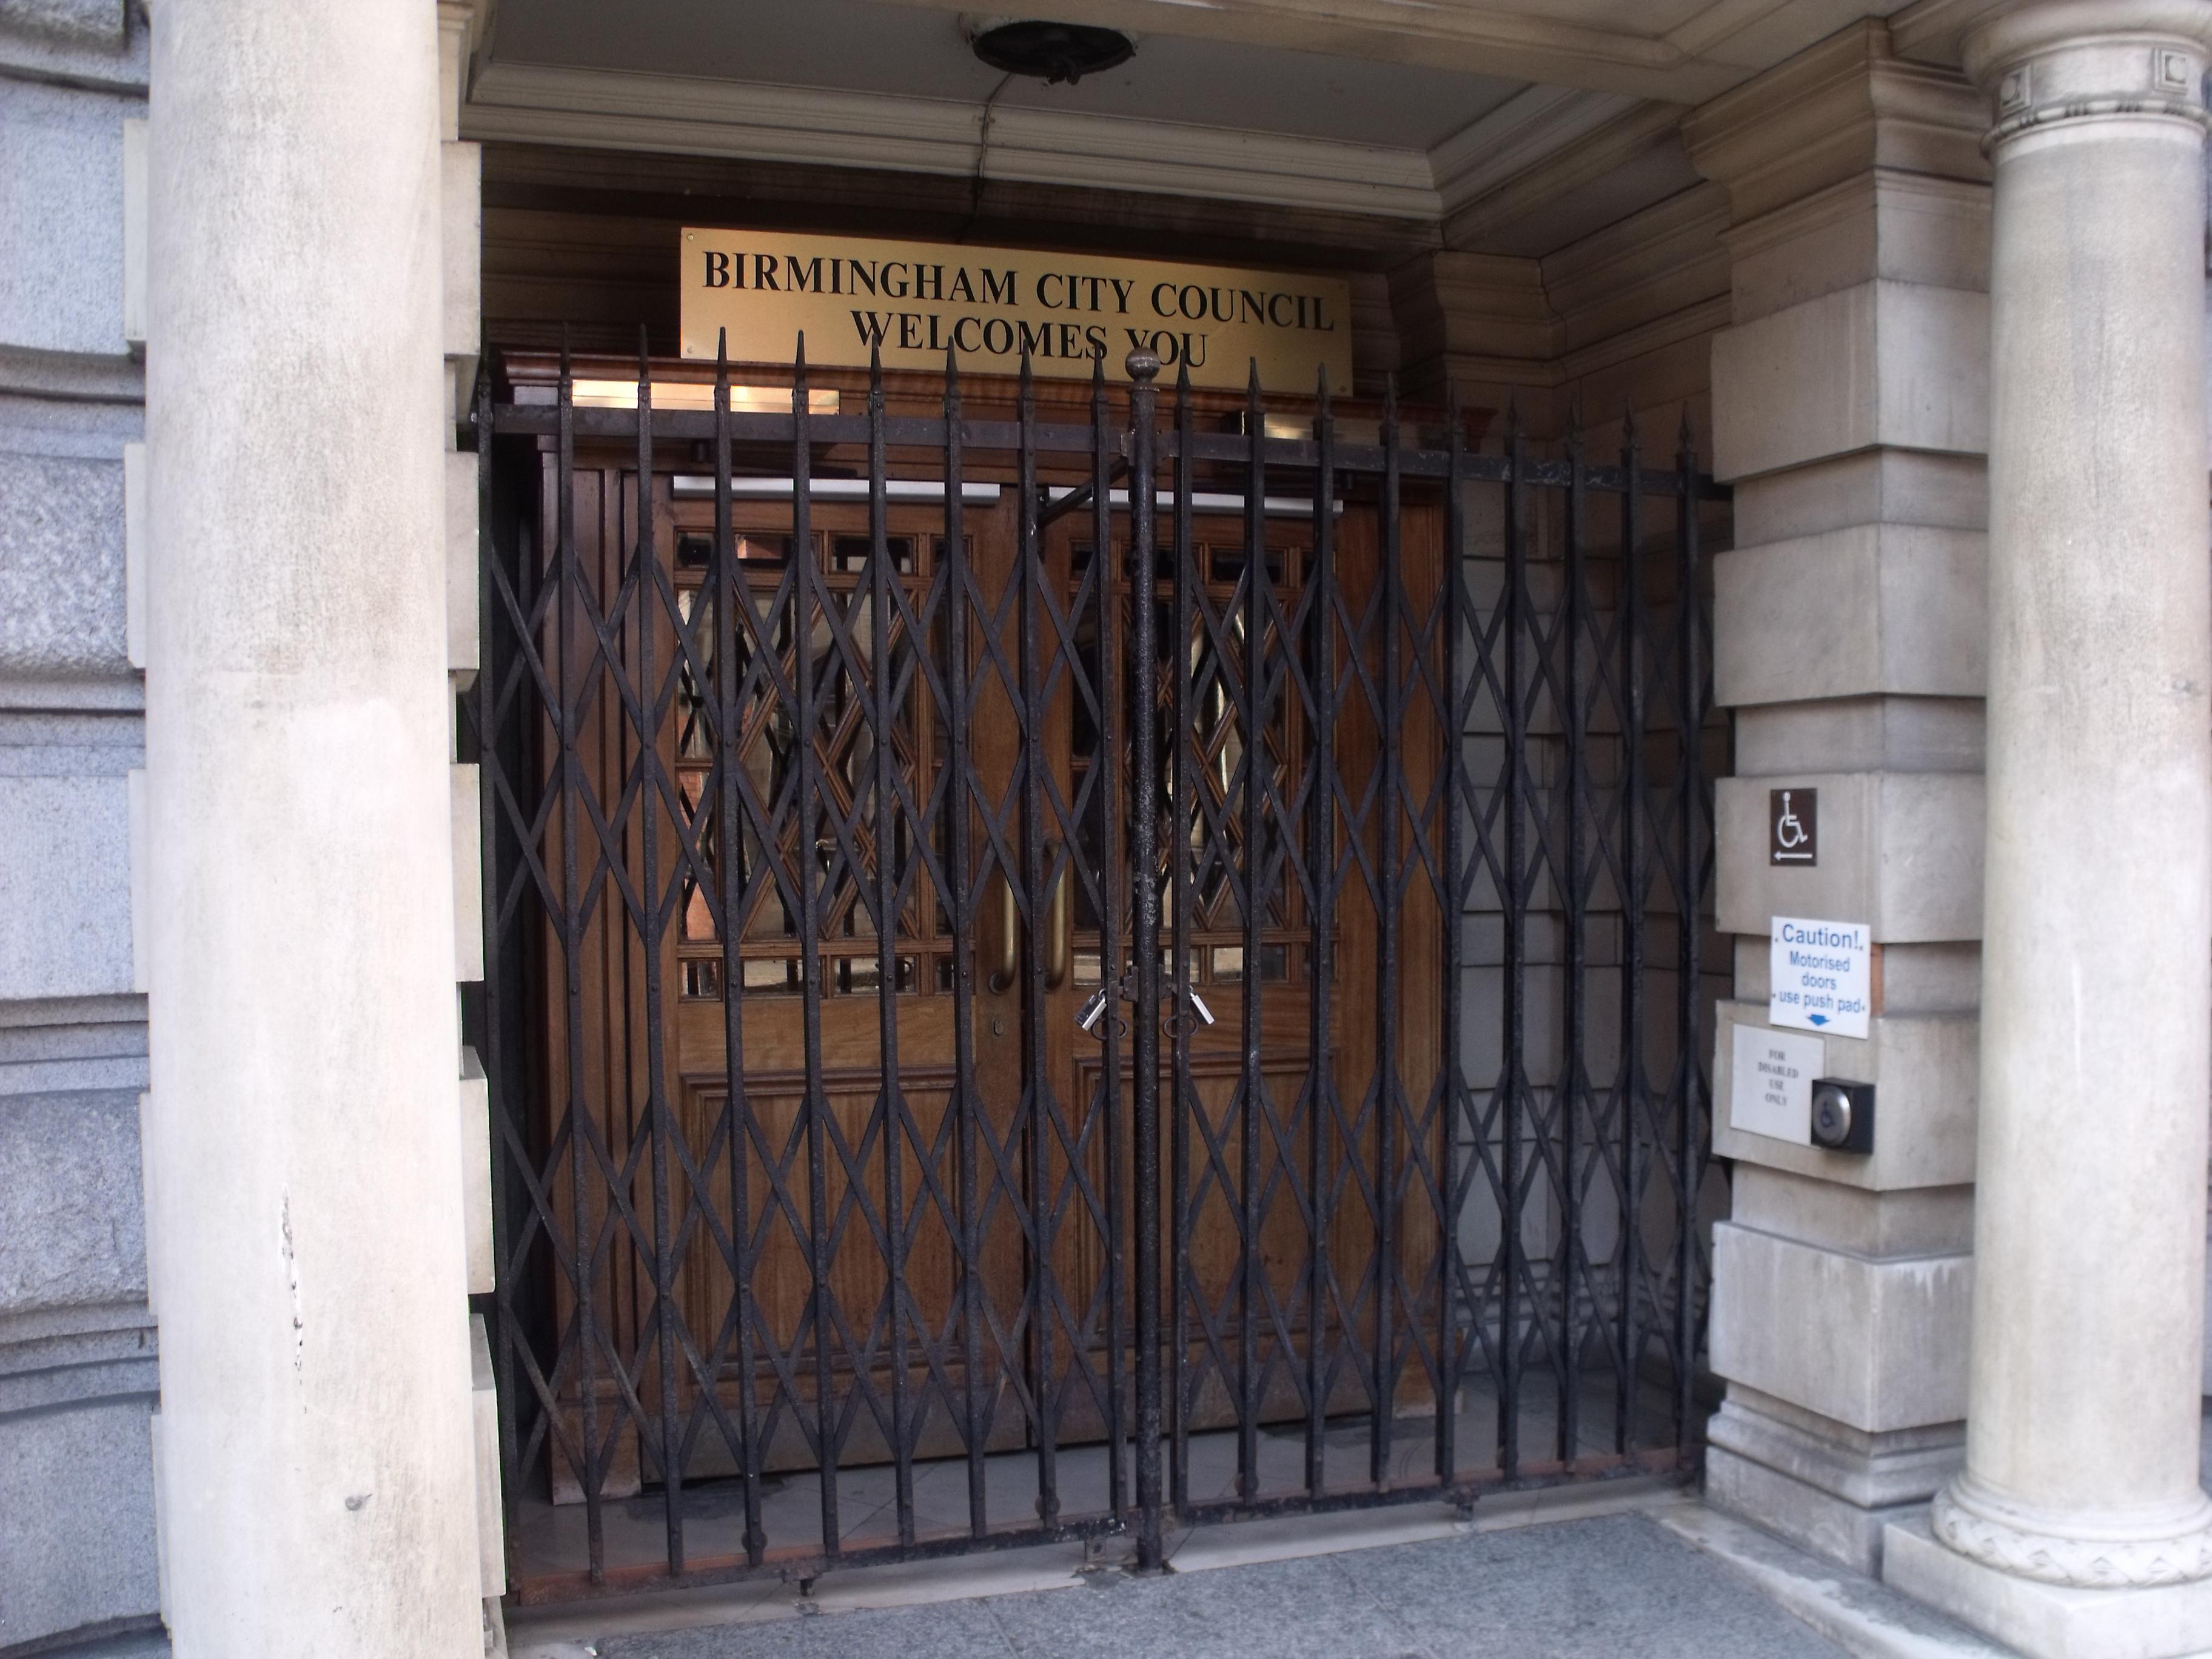 FileCouncil House Extension - Margaret Street Birmingham - gated doors (6988319331) & File:Council House Extension - Margaret Street Birmingham - gated ...